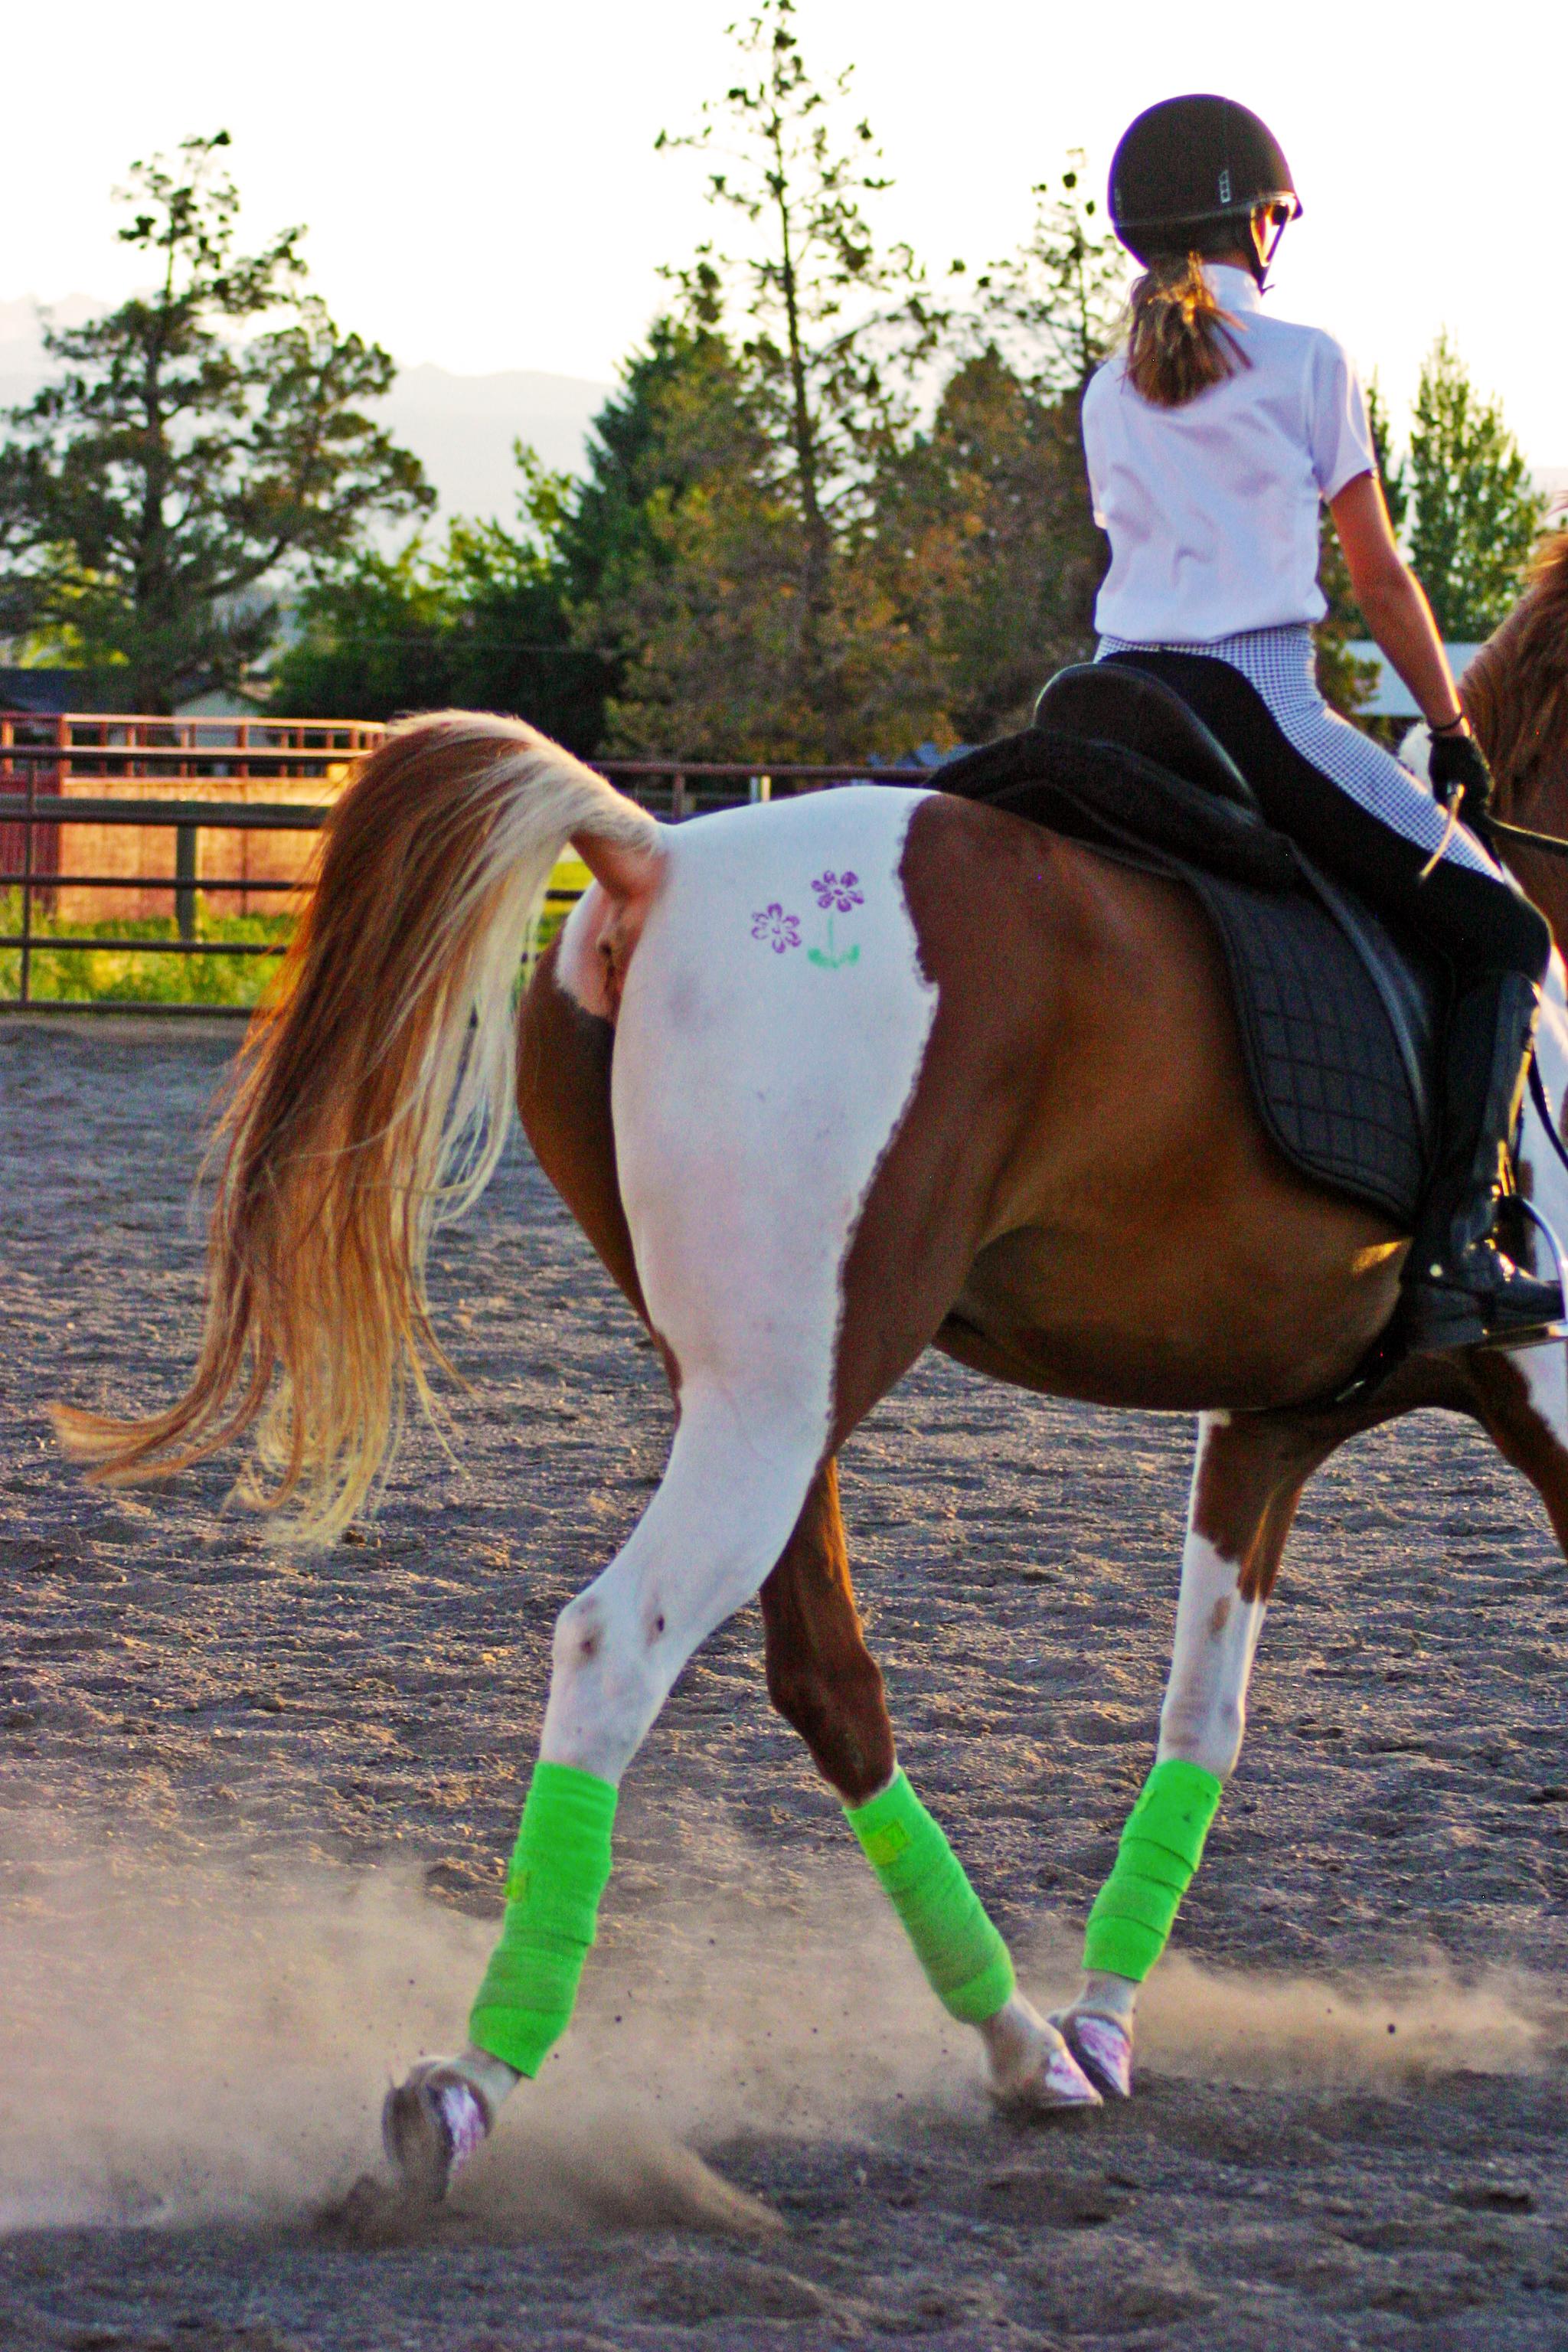 Lauren riding Charlie, her Arabian/Pinto